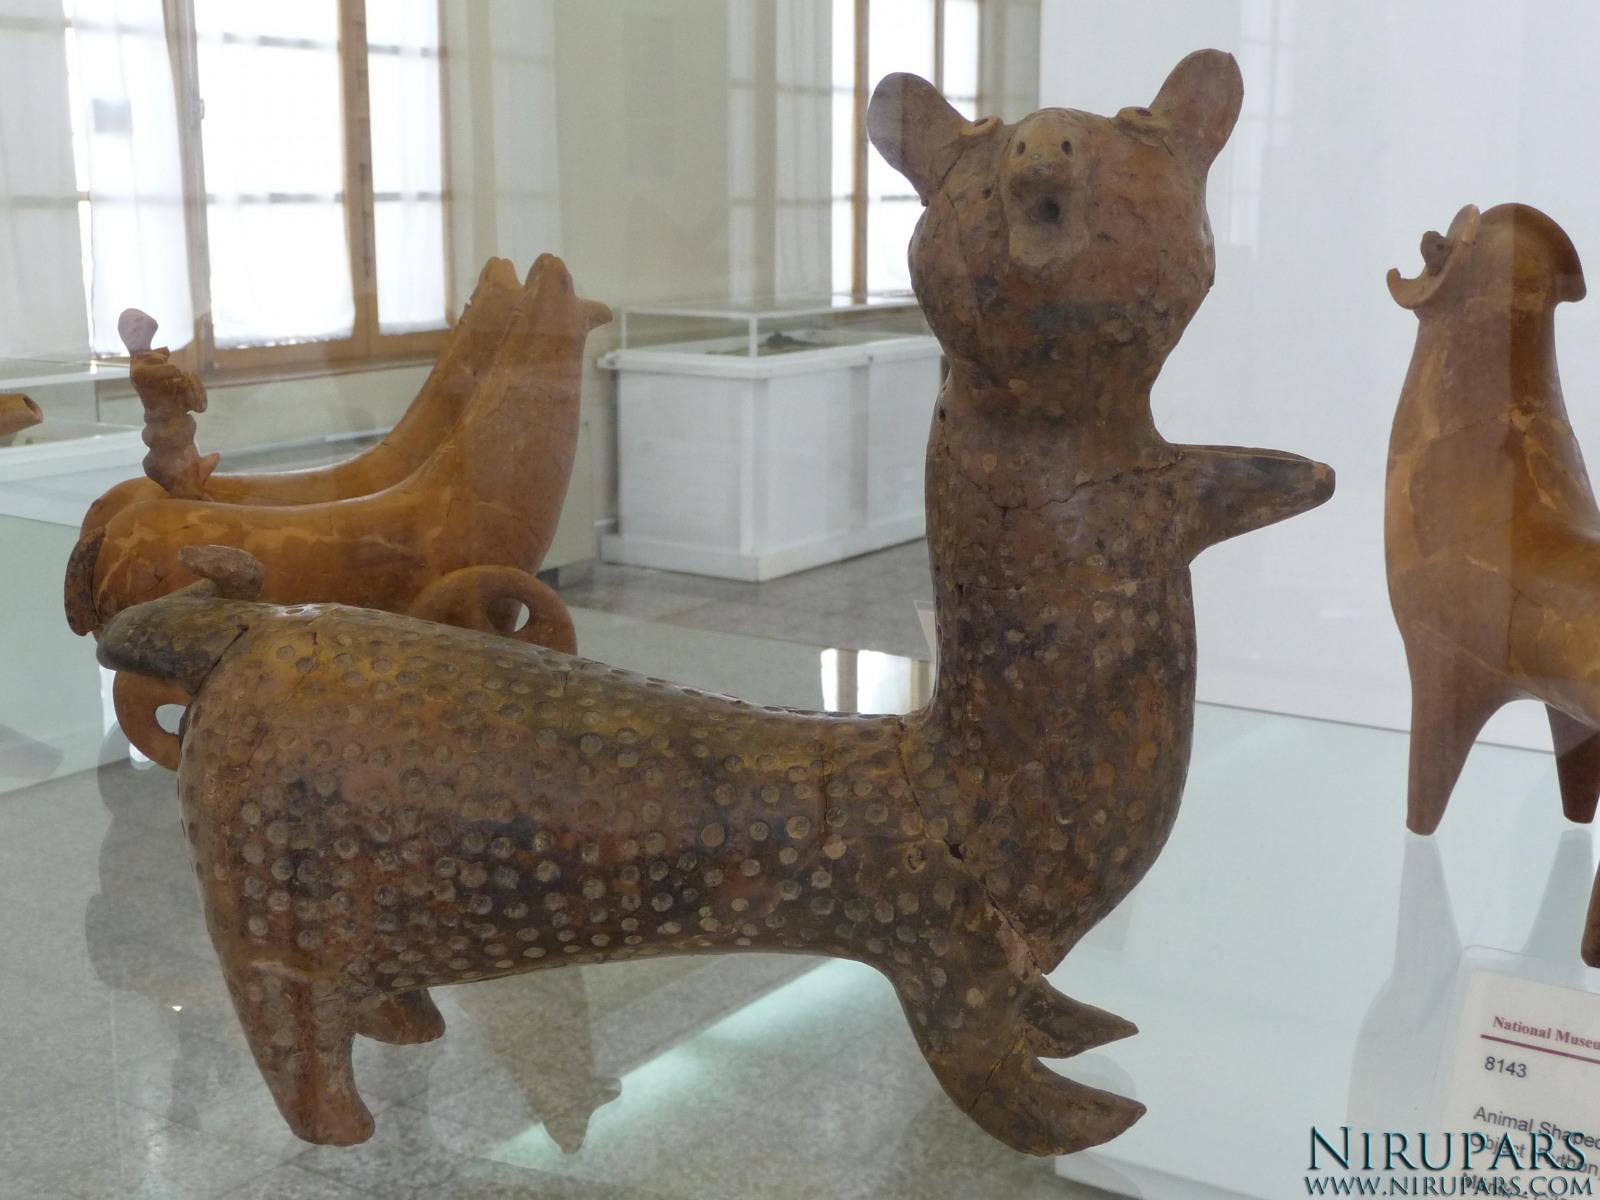 National Museum of Iran - Pottery Animal Figurine